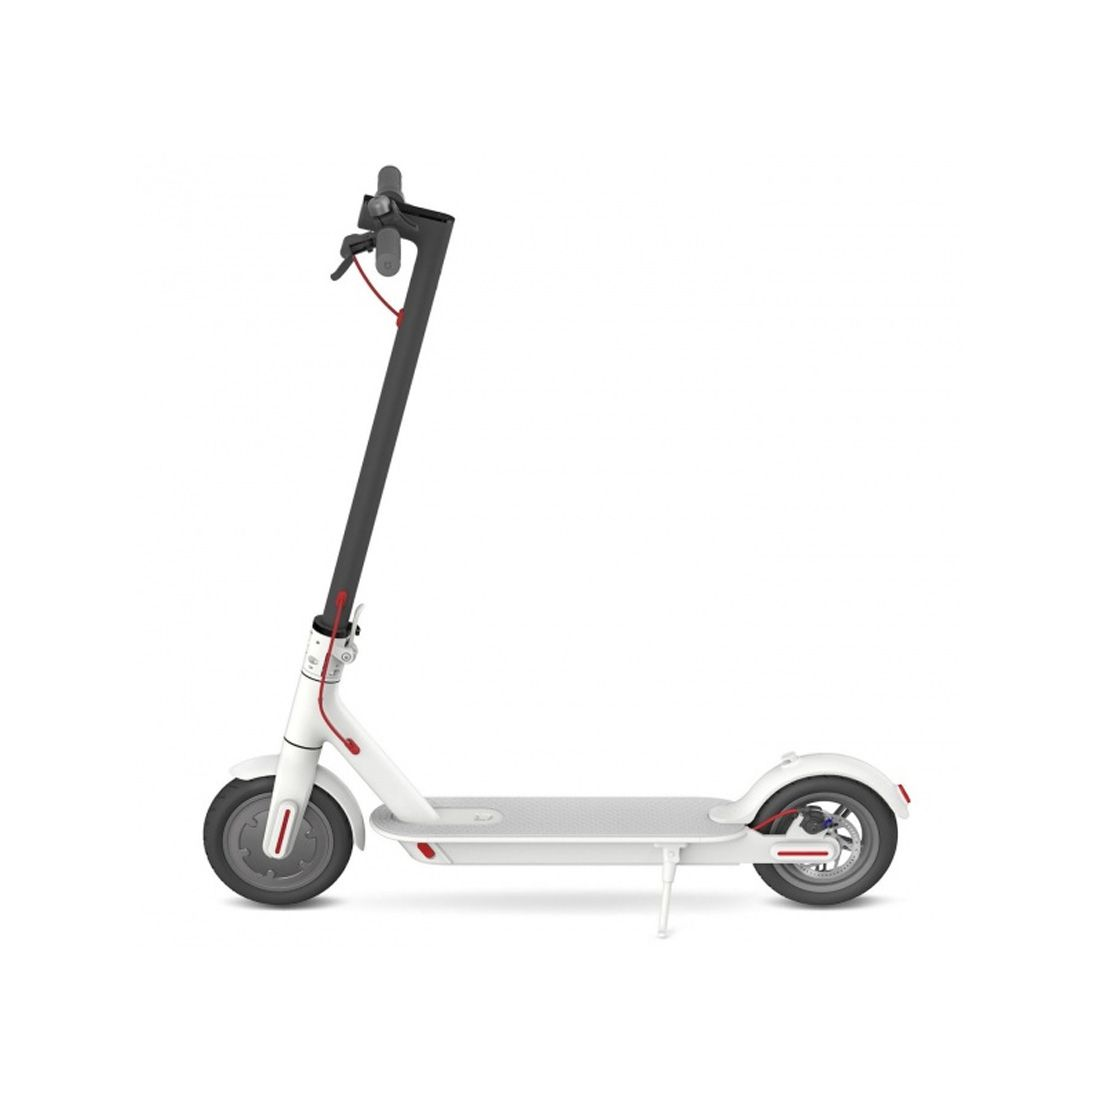 xiaomi mijia electric scooter m187. Black Bedroom Furniture Sets. Home Design Ideas